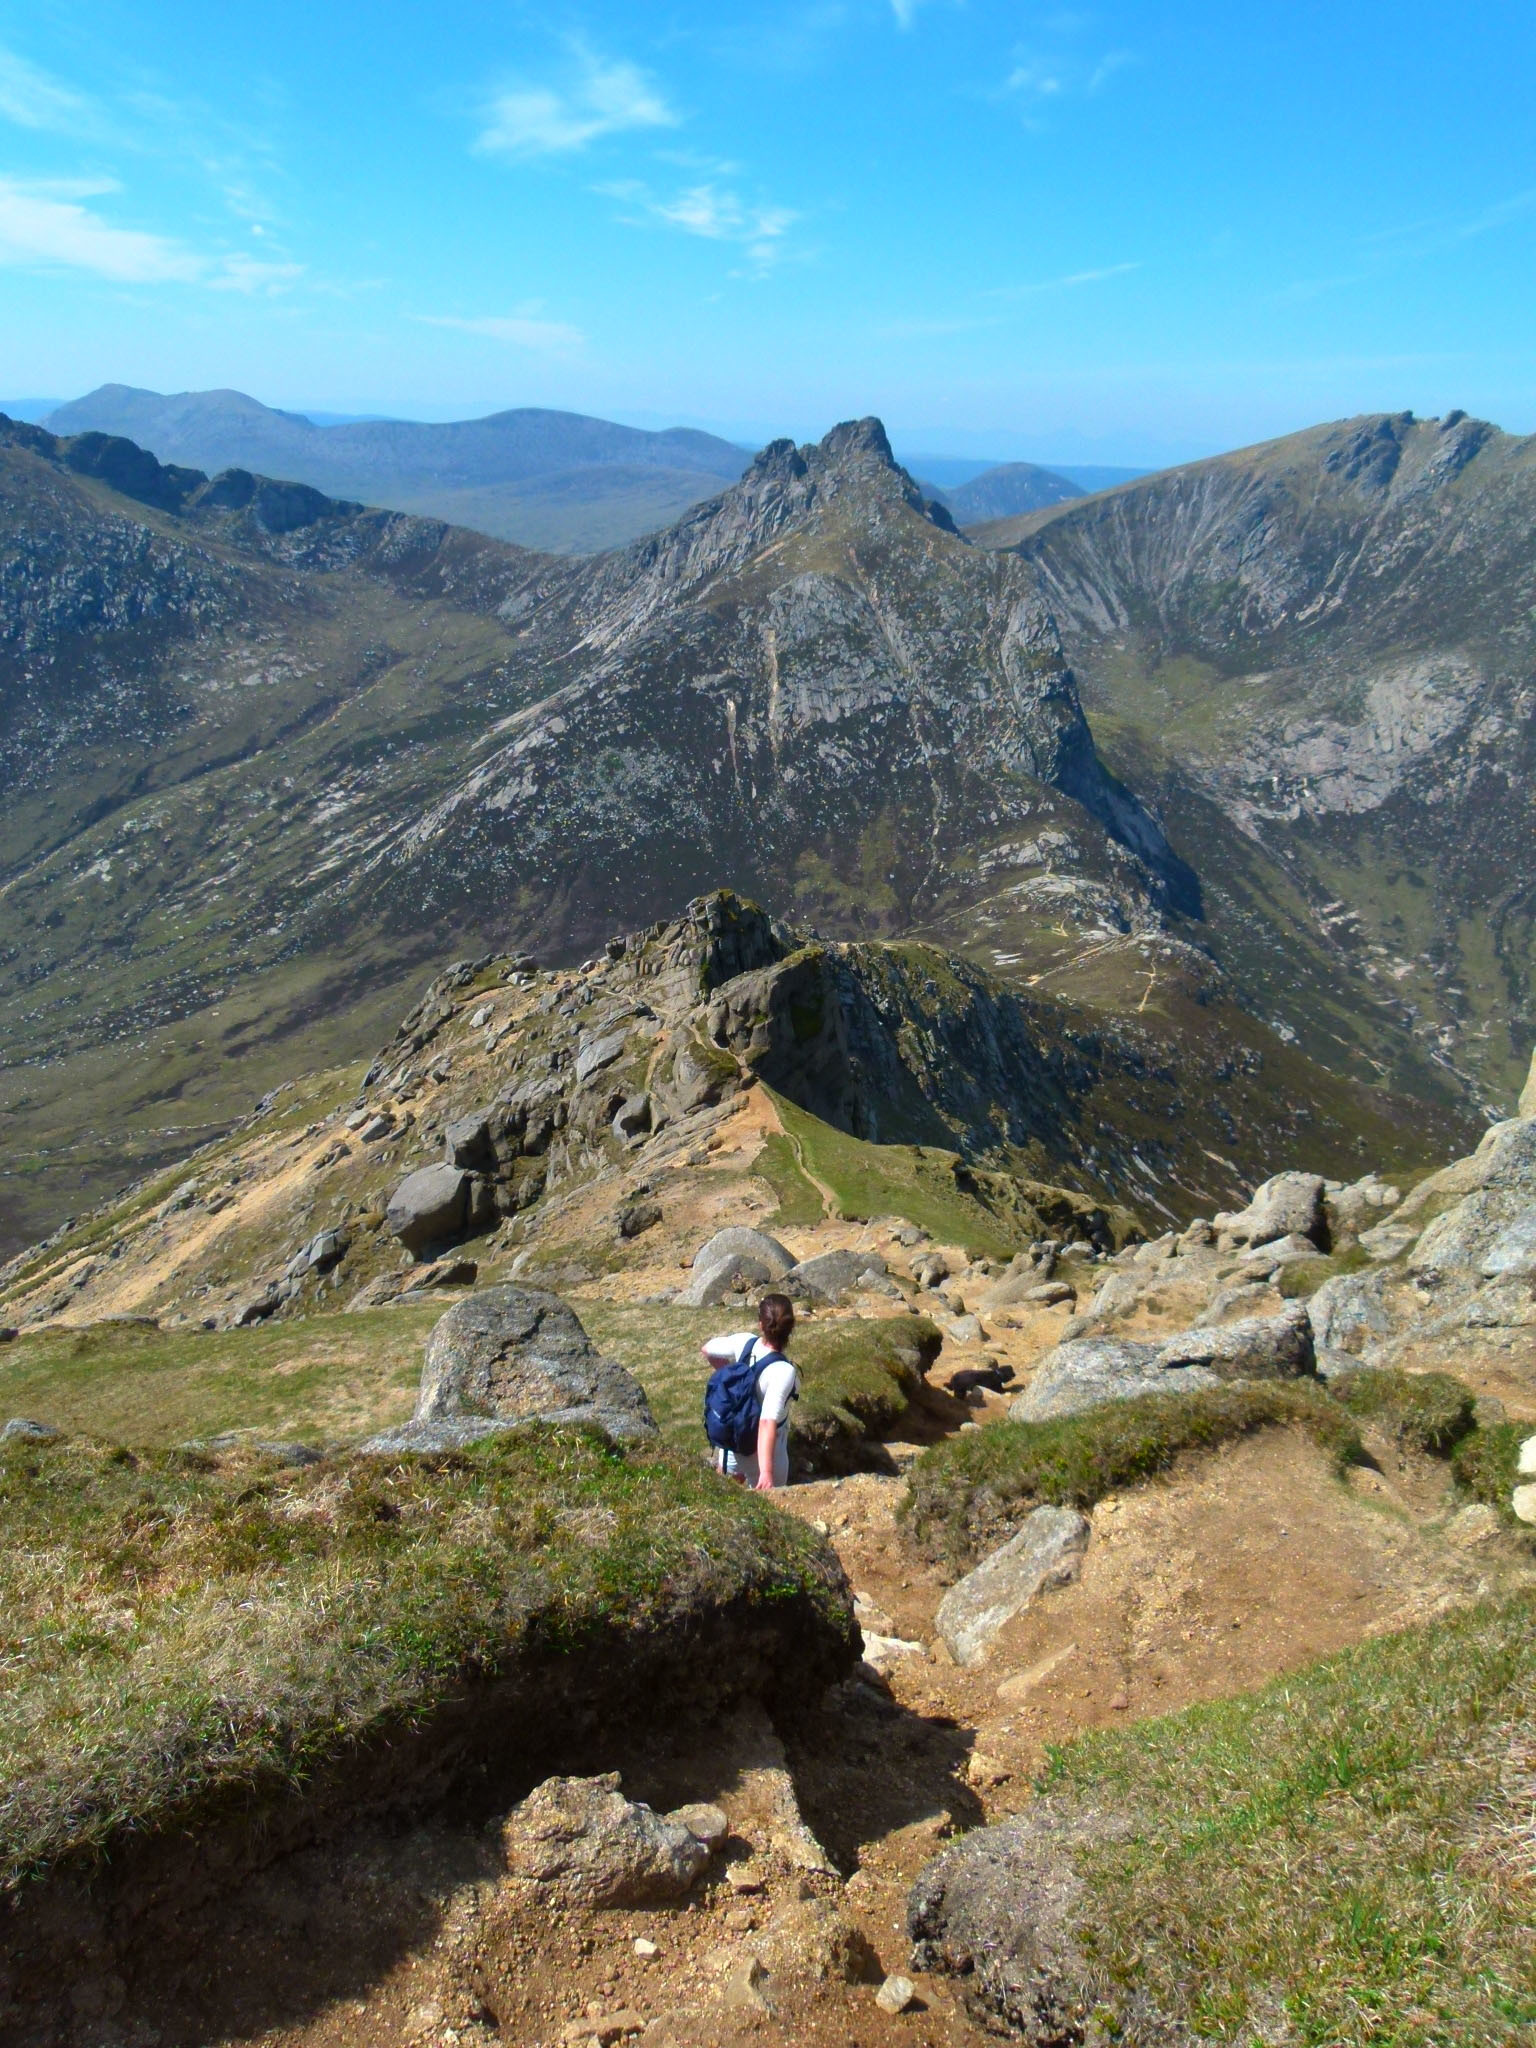 arran goat fell mountain scotland